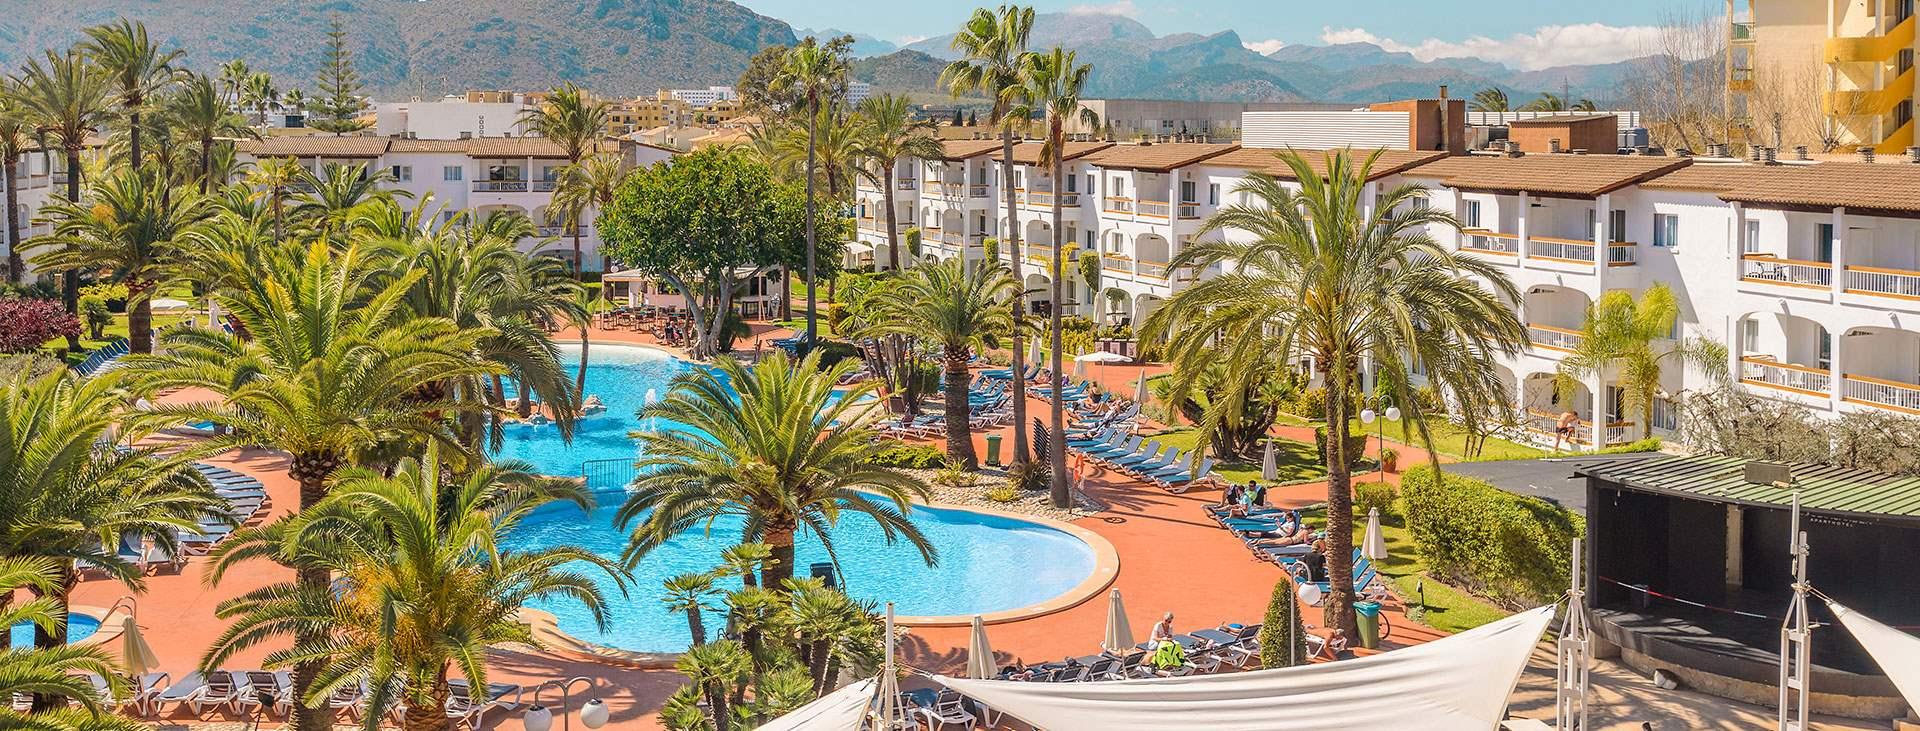 Alcudia Garden Bestil Hotel I Alcudia Hos Spies